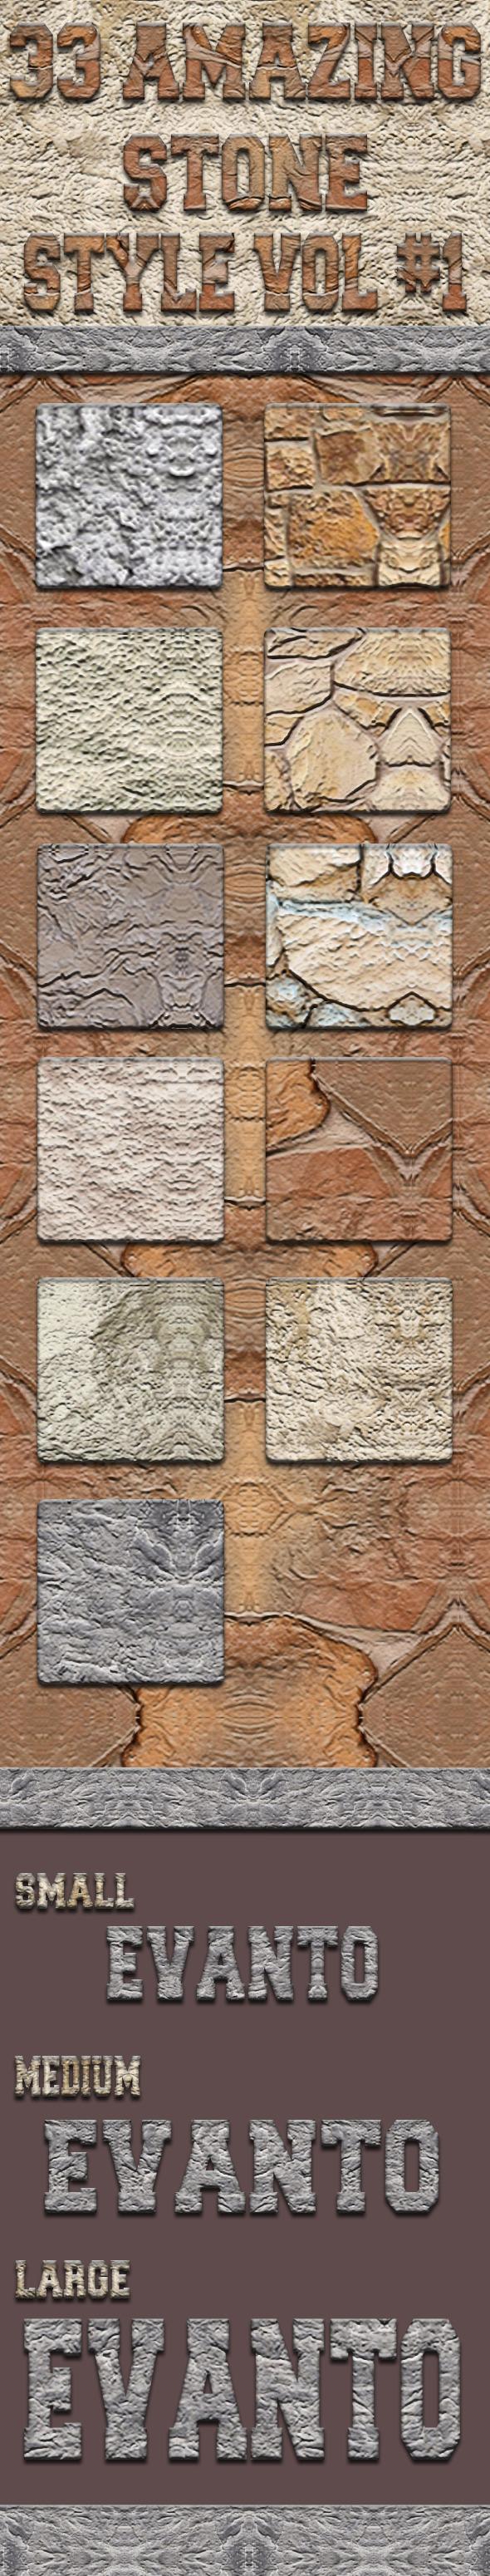 GraphicRiver 33 Amazing Stone Styles Vol 1 11256282